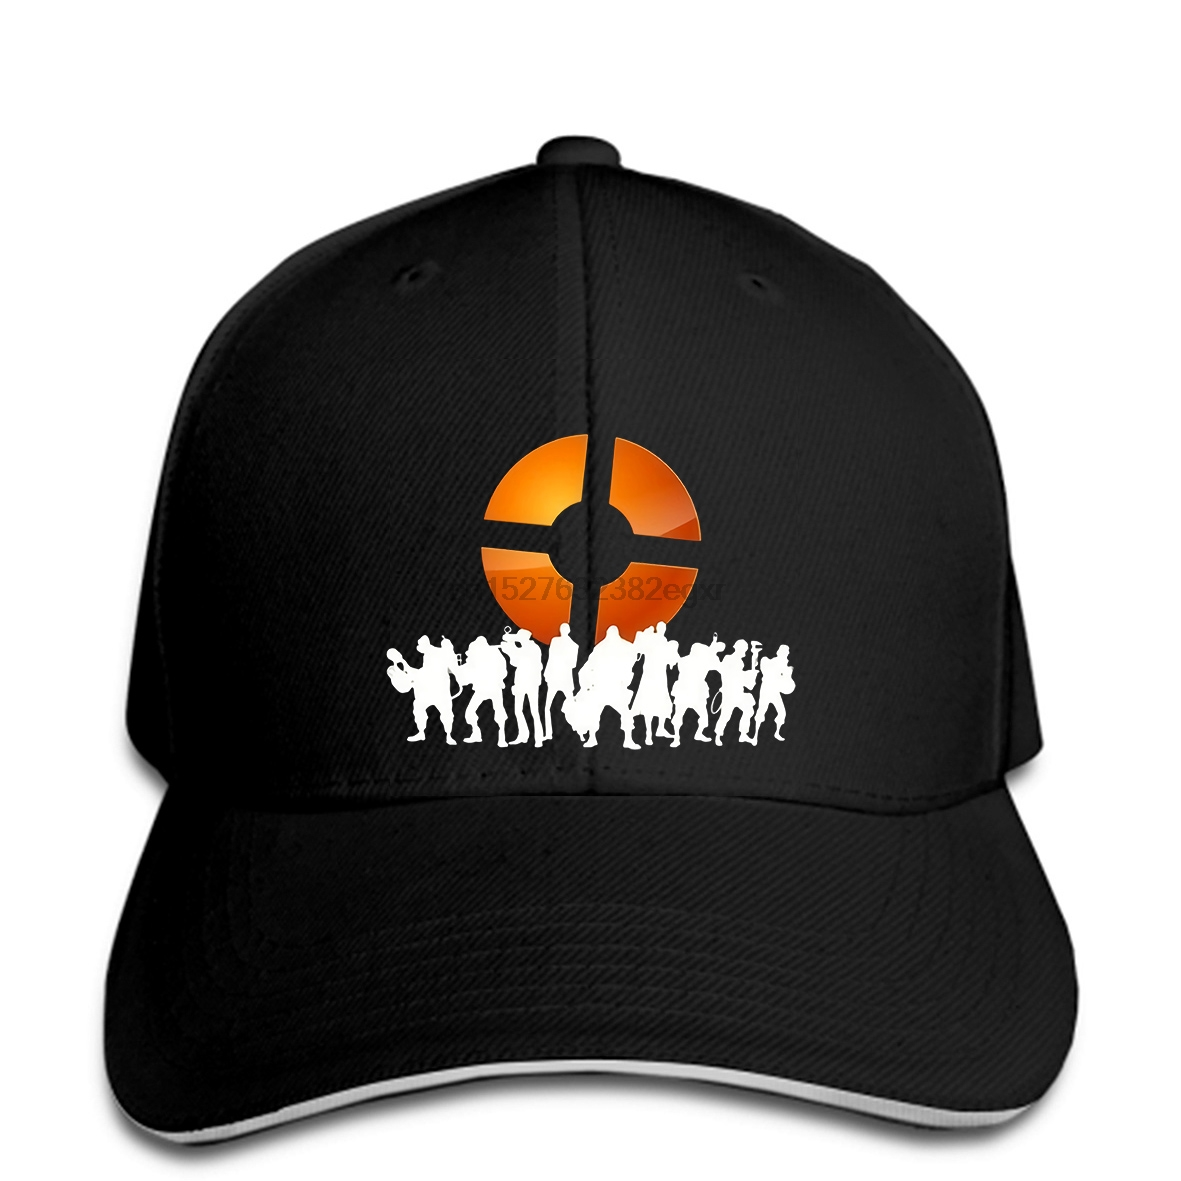 Men Baseball Cap Team Fortress 2 Logo Baseball Cap Black Funny